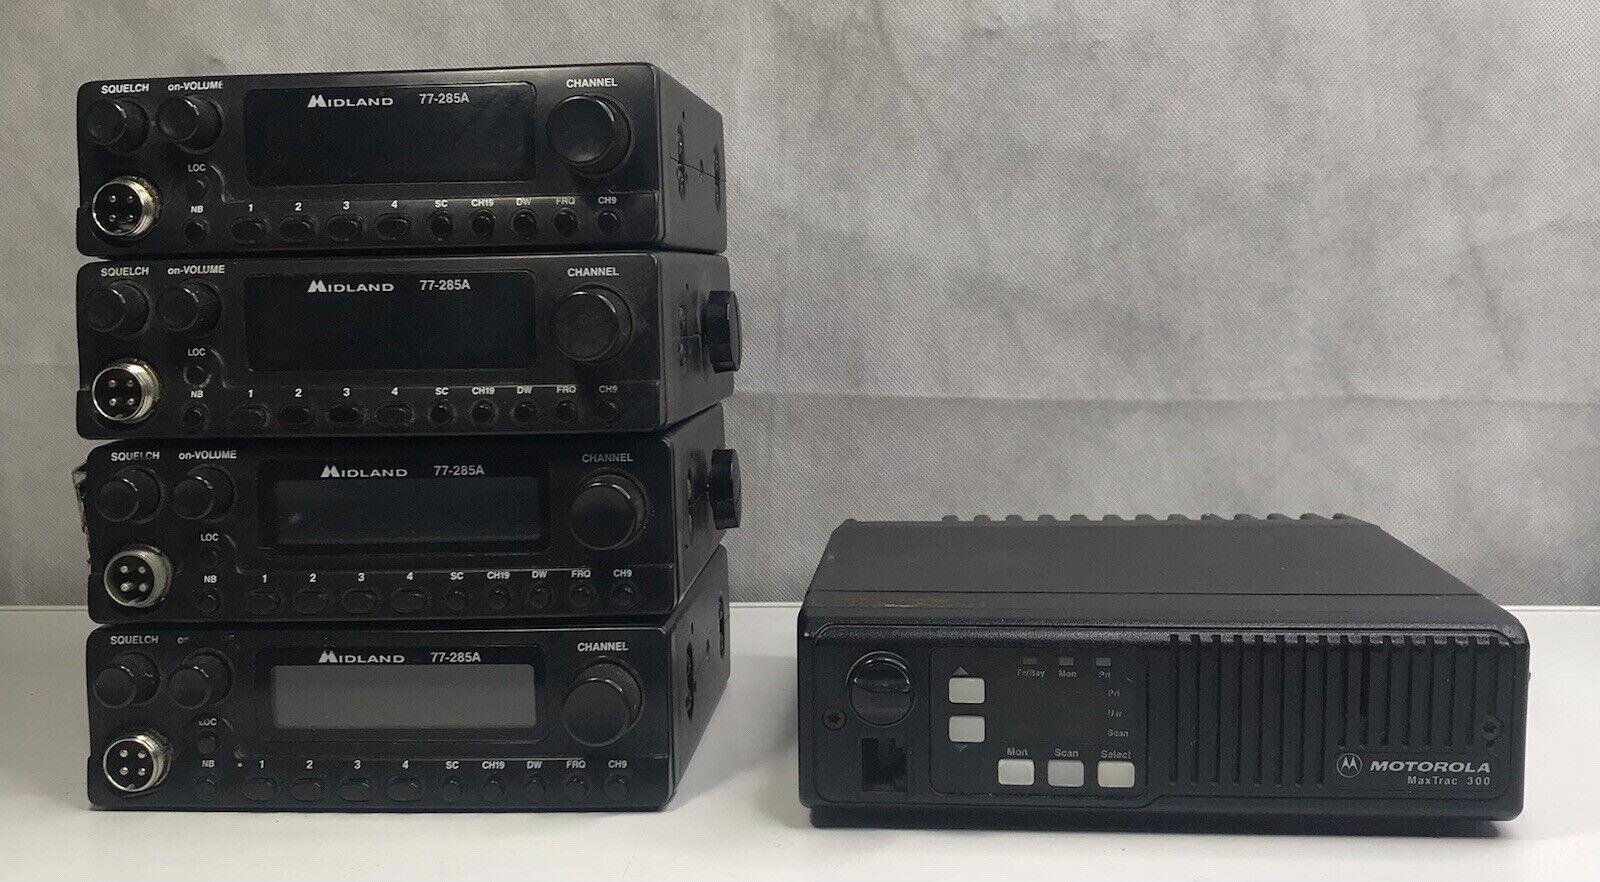 bzmsbellster Lot Of 4 ~ Midland 77-285A ~ CB Radio ~ 1 Motorola MaxTrac 300 ~ Parts/repair